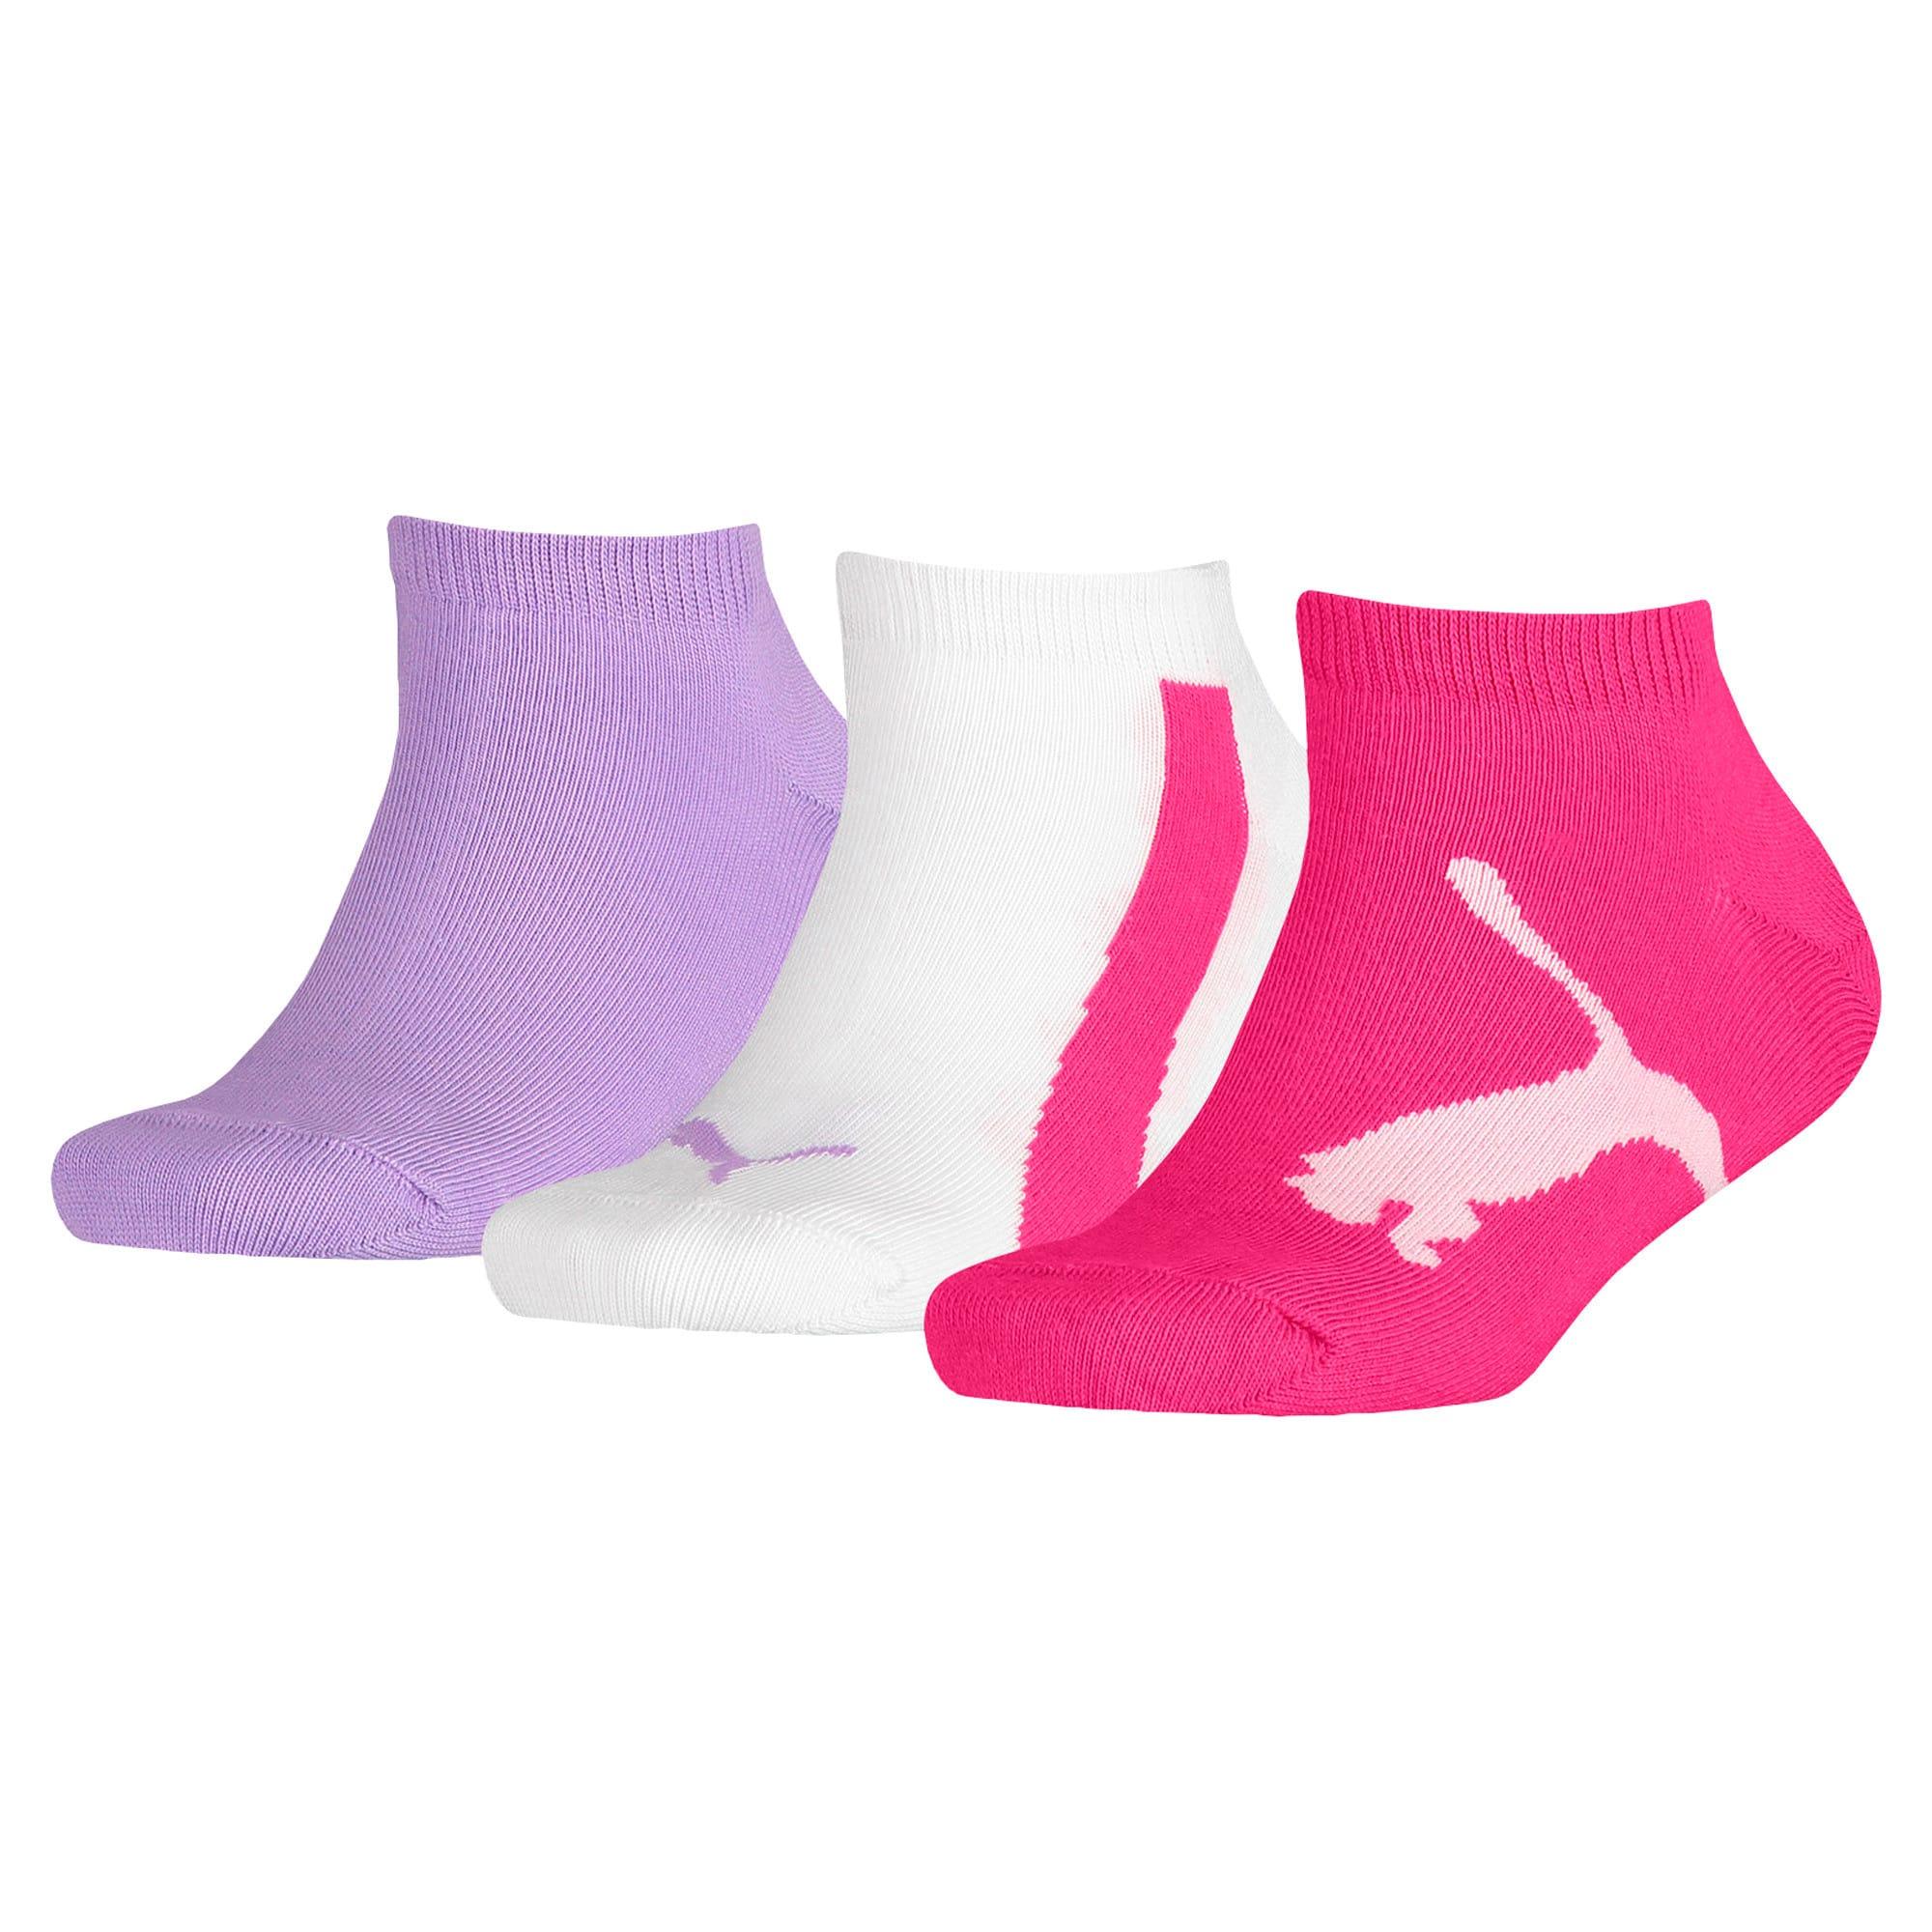 PUMA Kids' Lifestyle Trainer Socks 3 Pack, Bianco/Viola, Taglia 35-38